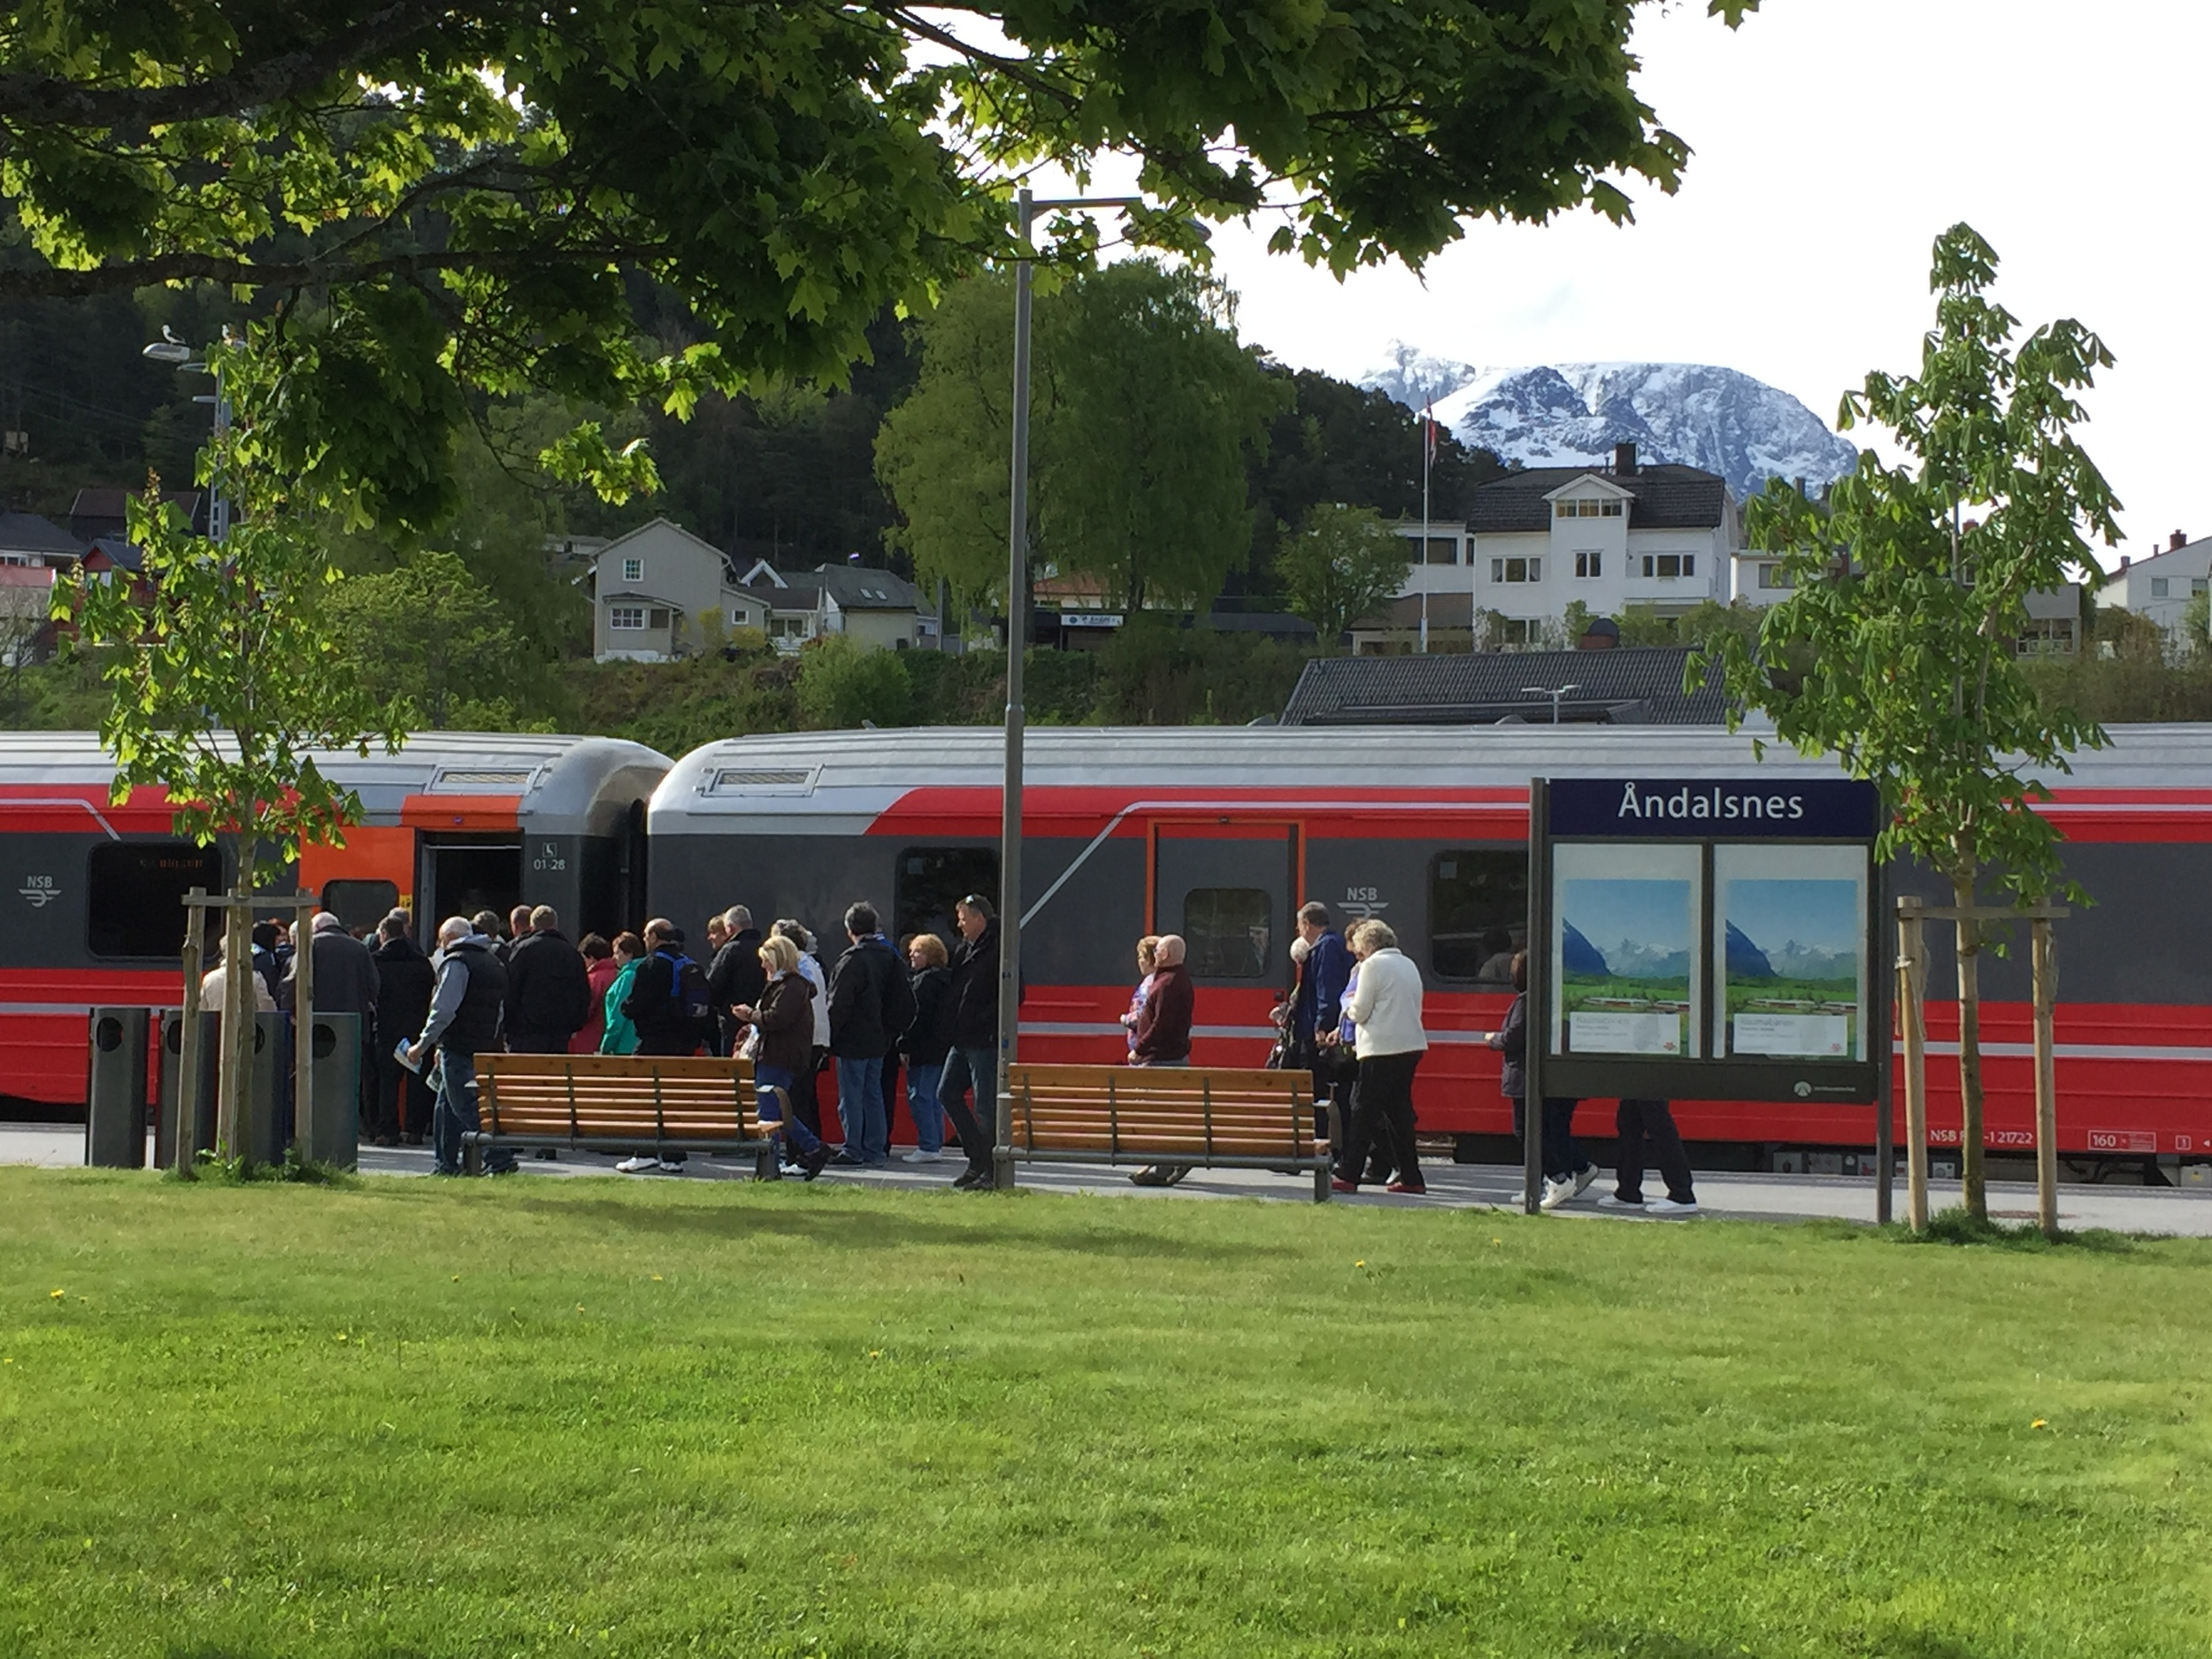 Turister klare for tur på Raumabanen. Foto: Odd Roar Lange